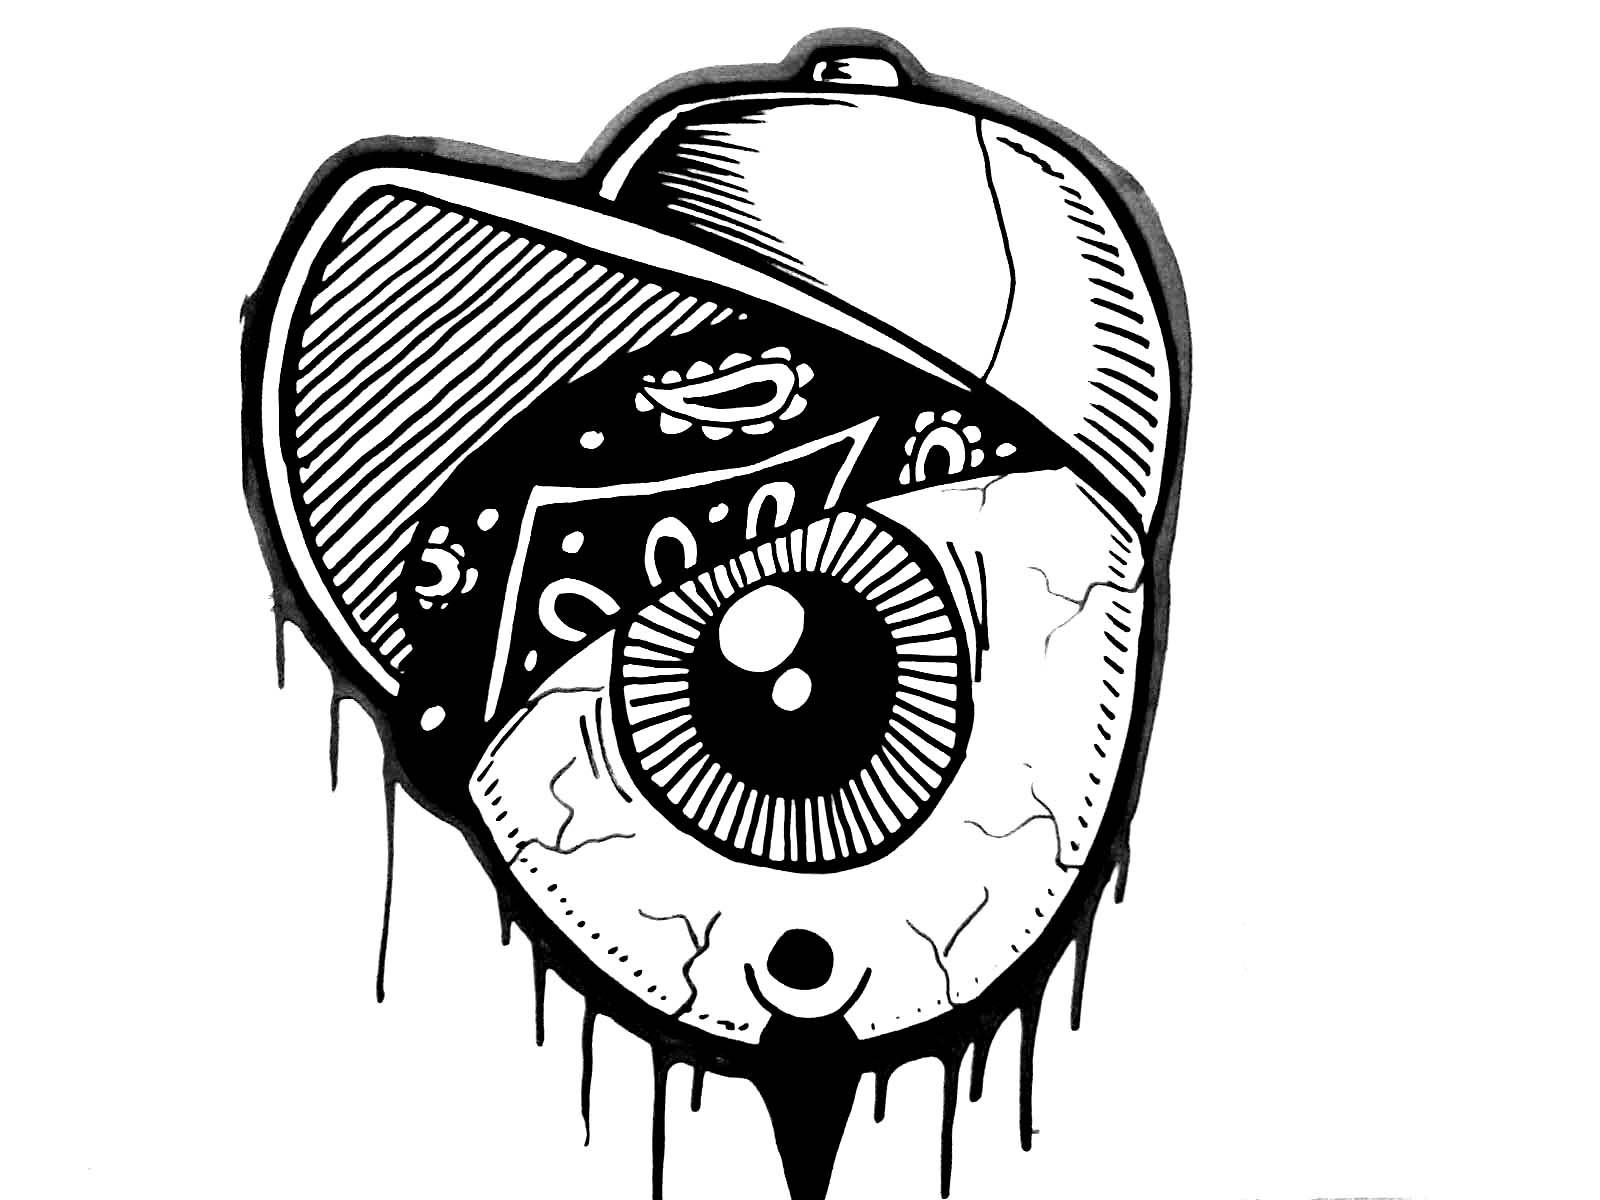 1600x1200 Gangster Lk Graffiti Drawings How To Draw A One Eye Gangsta